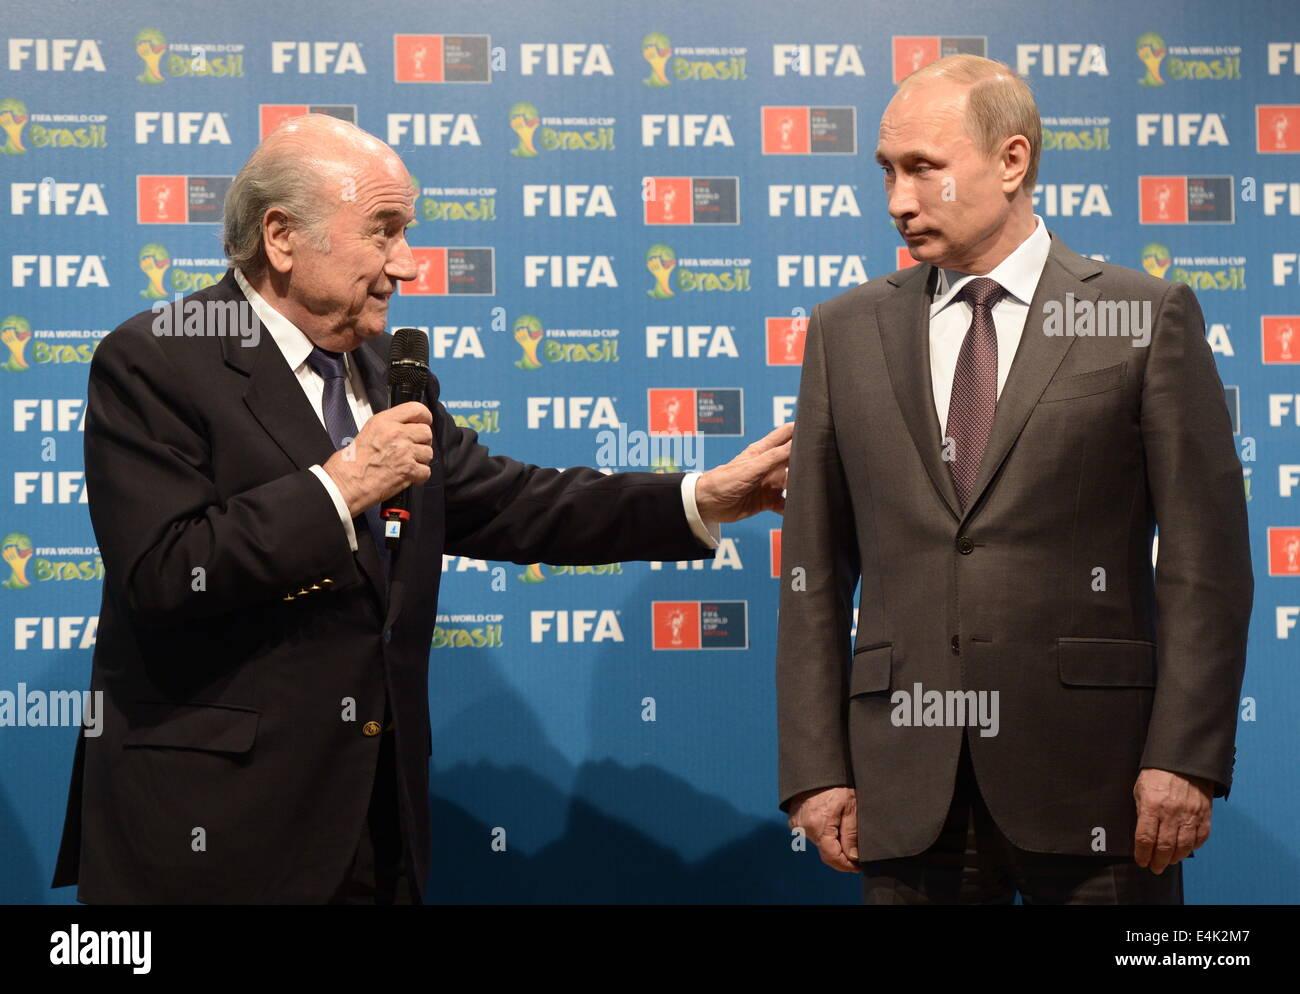 Rio De Janeiro, Brazil. 13th July, 2014. FIFA President Joseph Blatter (L) and Russian President Vladimir Putin - Stock Image